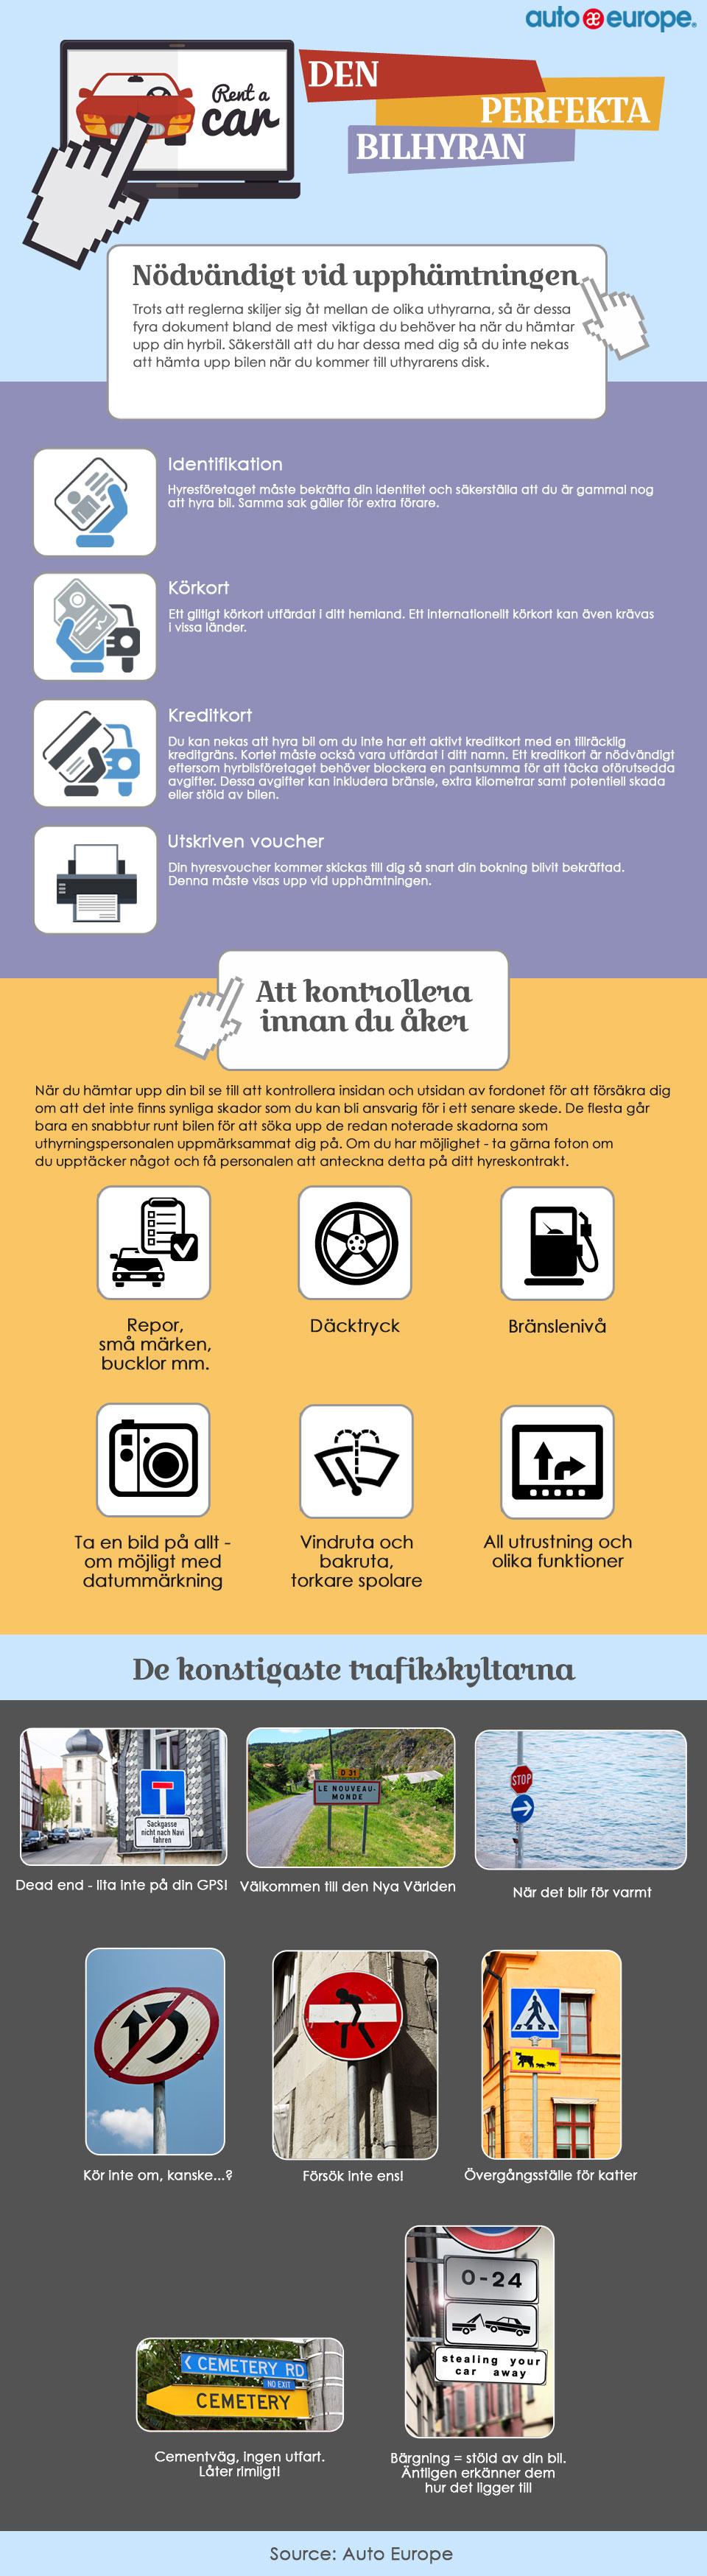 Infografik - den perfekta bilhyran